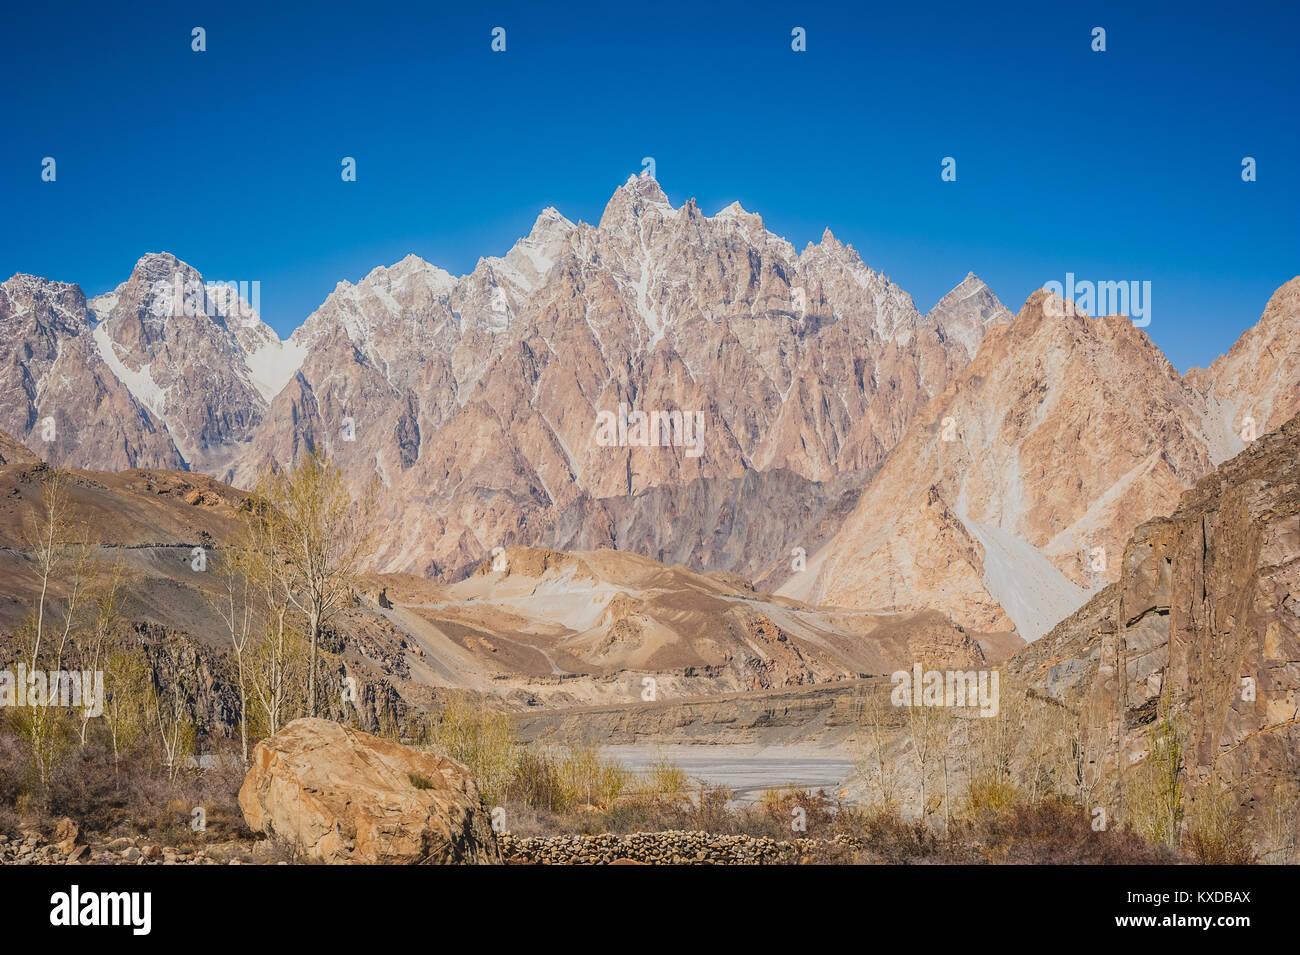 Beuatiful landscape of Northern Pakistan. Passu region. Karakorum mountains in Pakistan. - Stock Image